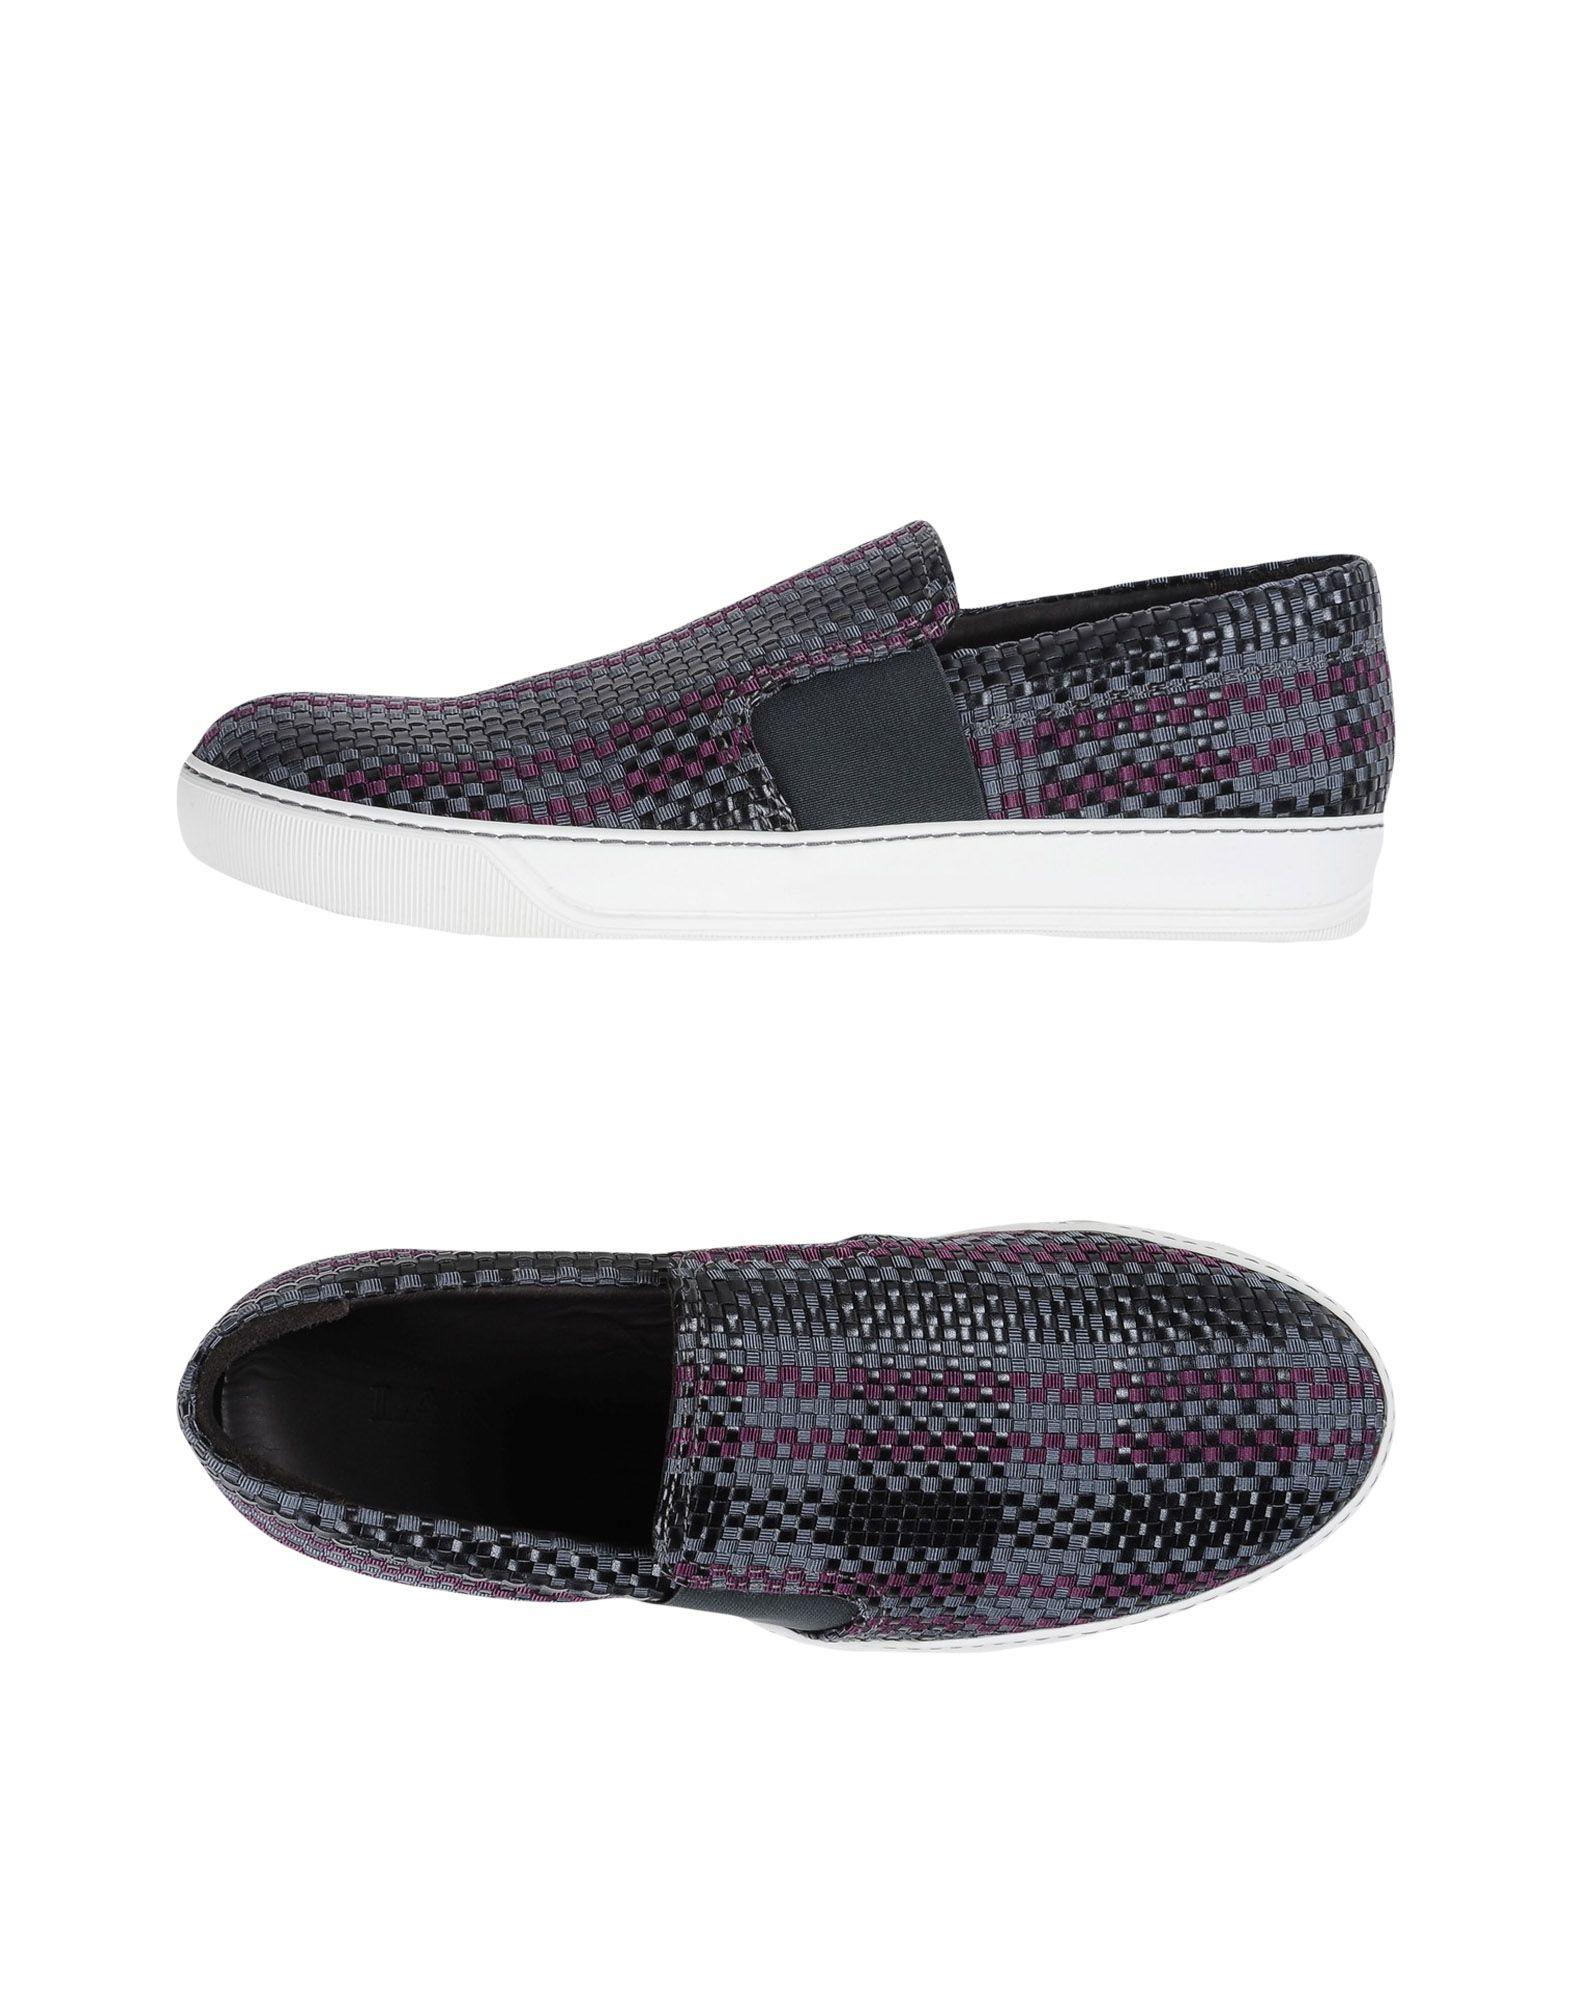 Moda Sneakers Lanvin Uomo - 11216541WO